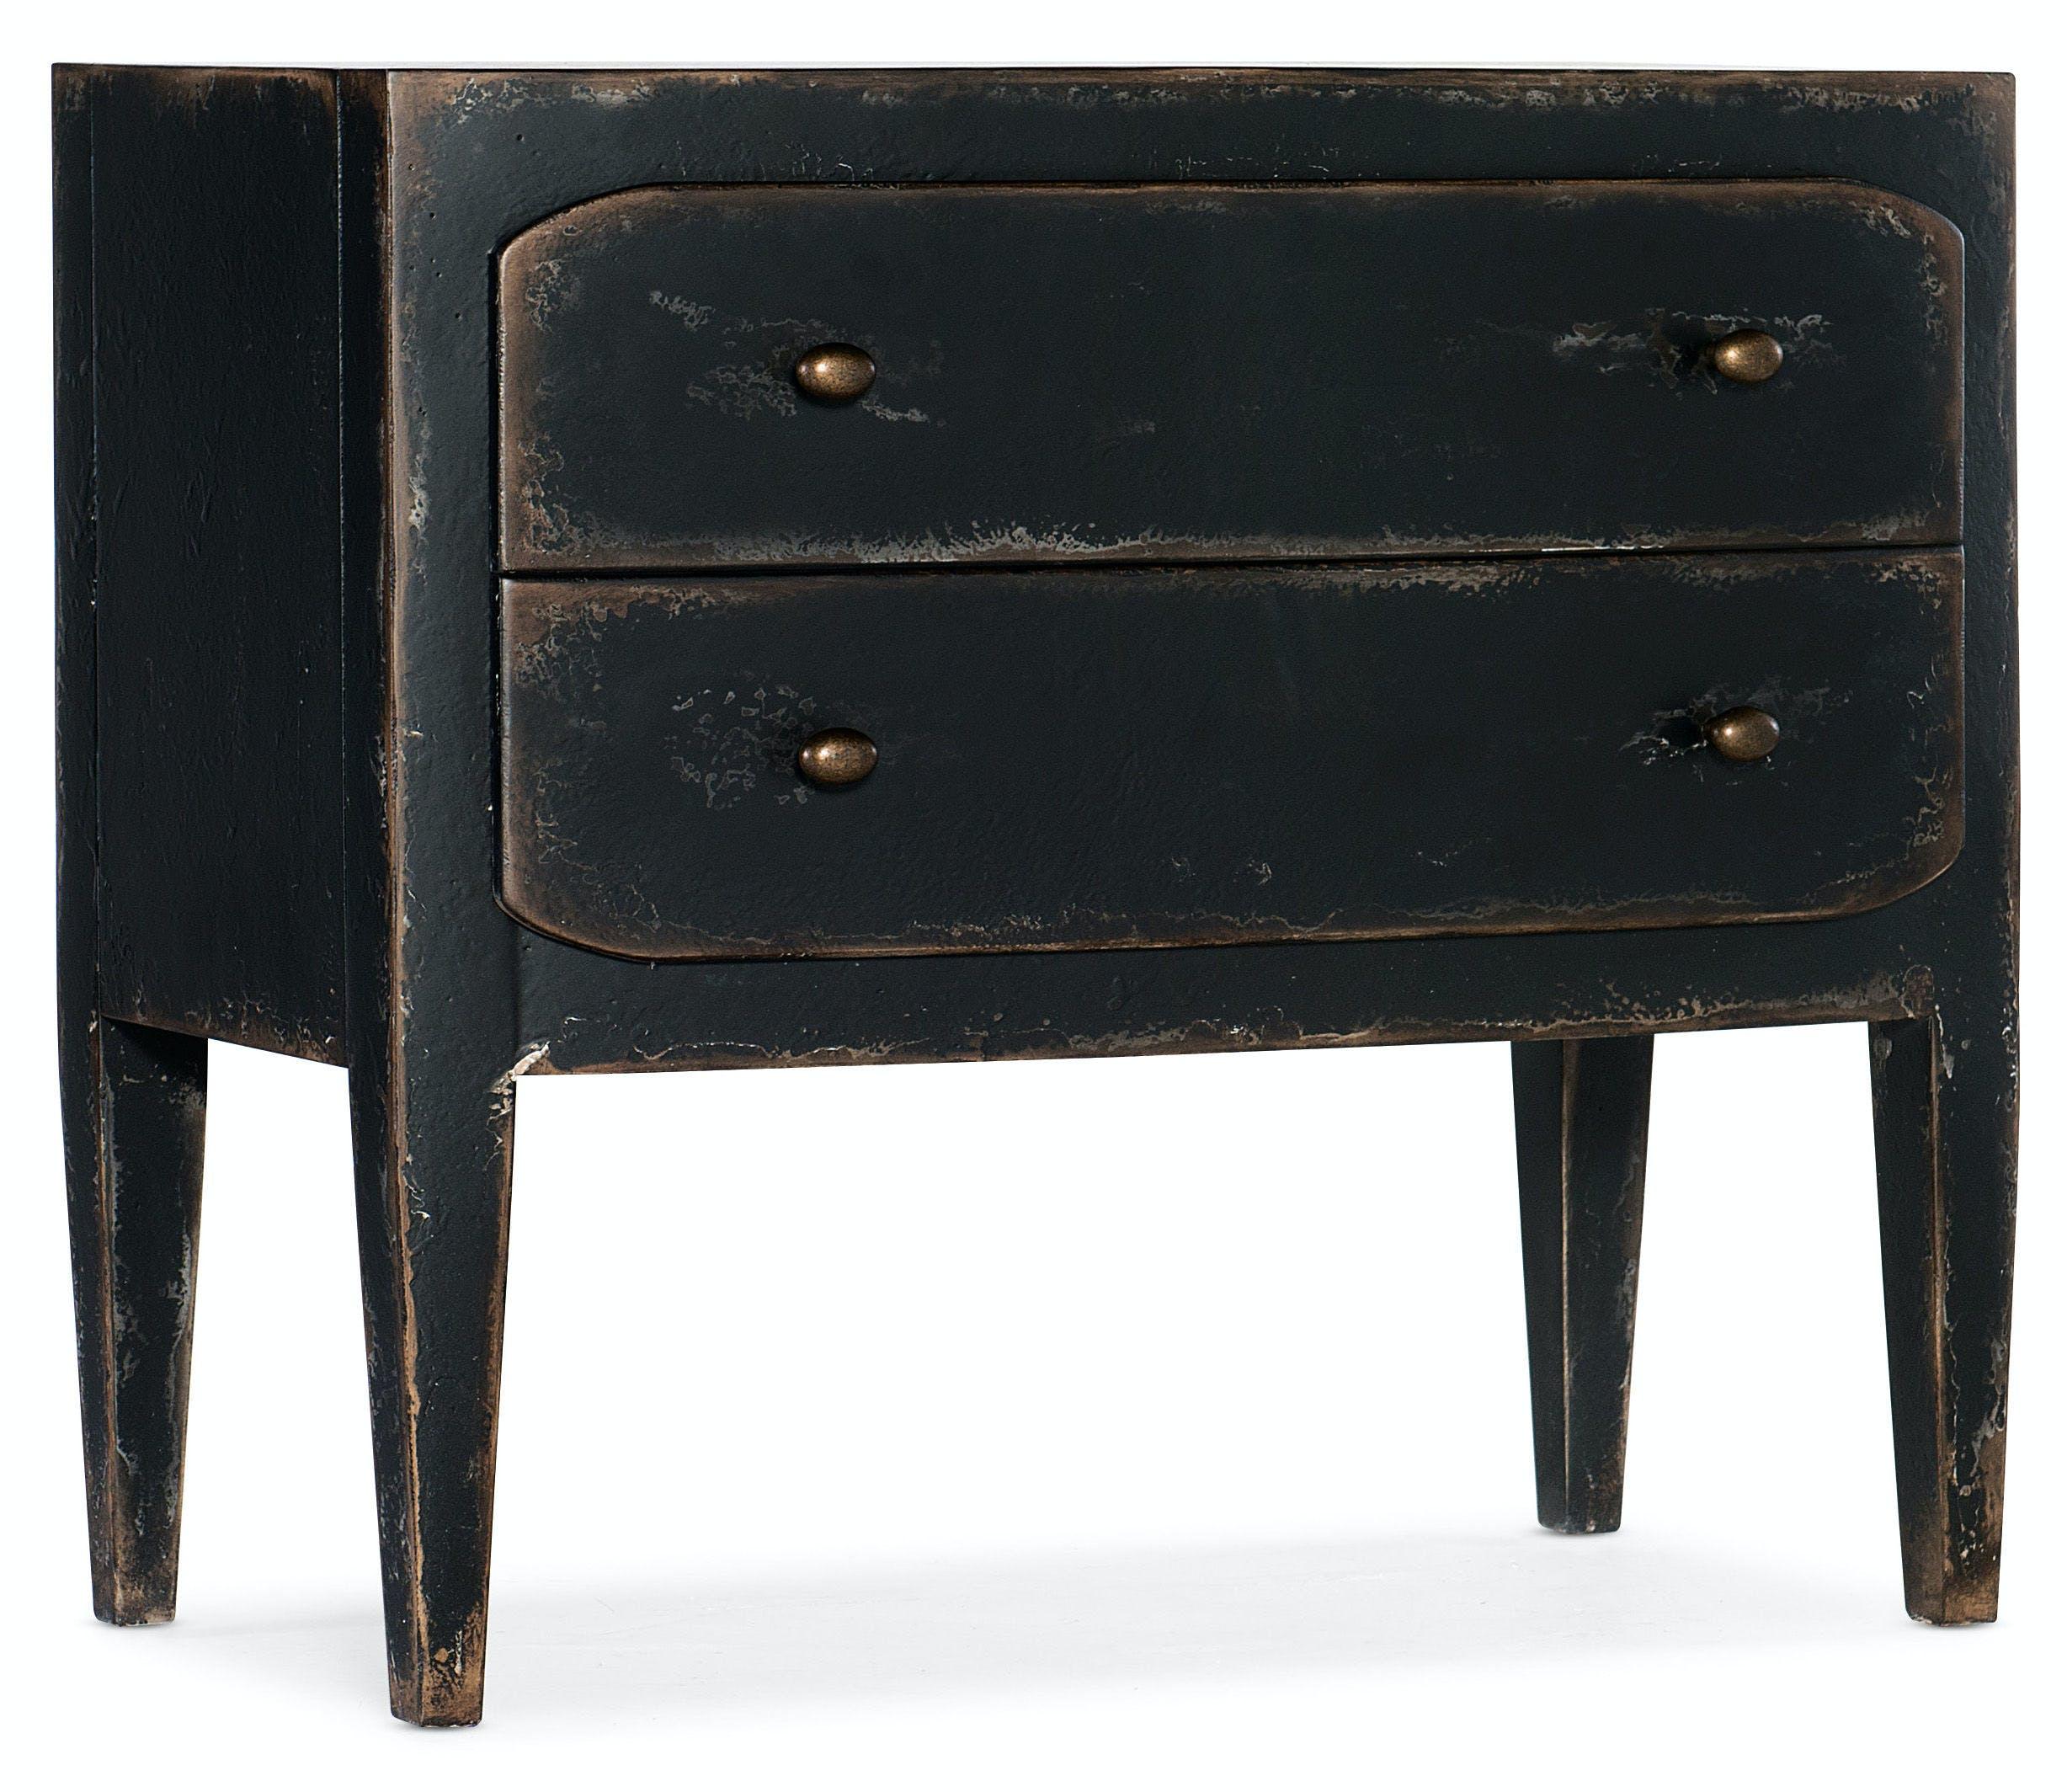 Hooker Furniture Bedroom Ciao Bella Two Drawer Nightstand Black 5805 90016 99